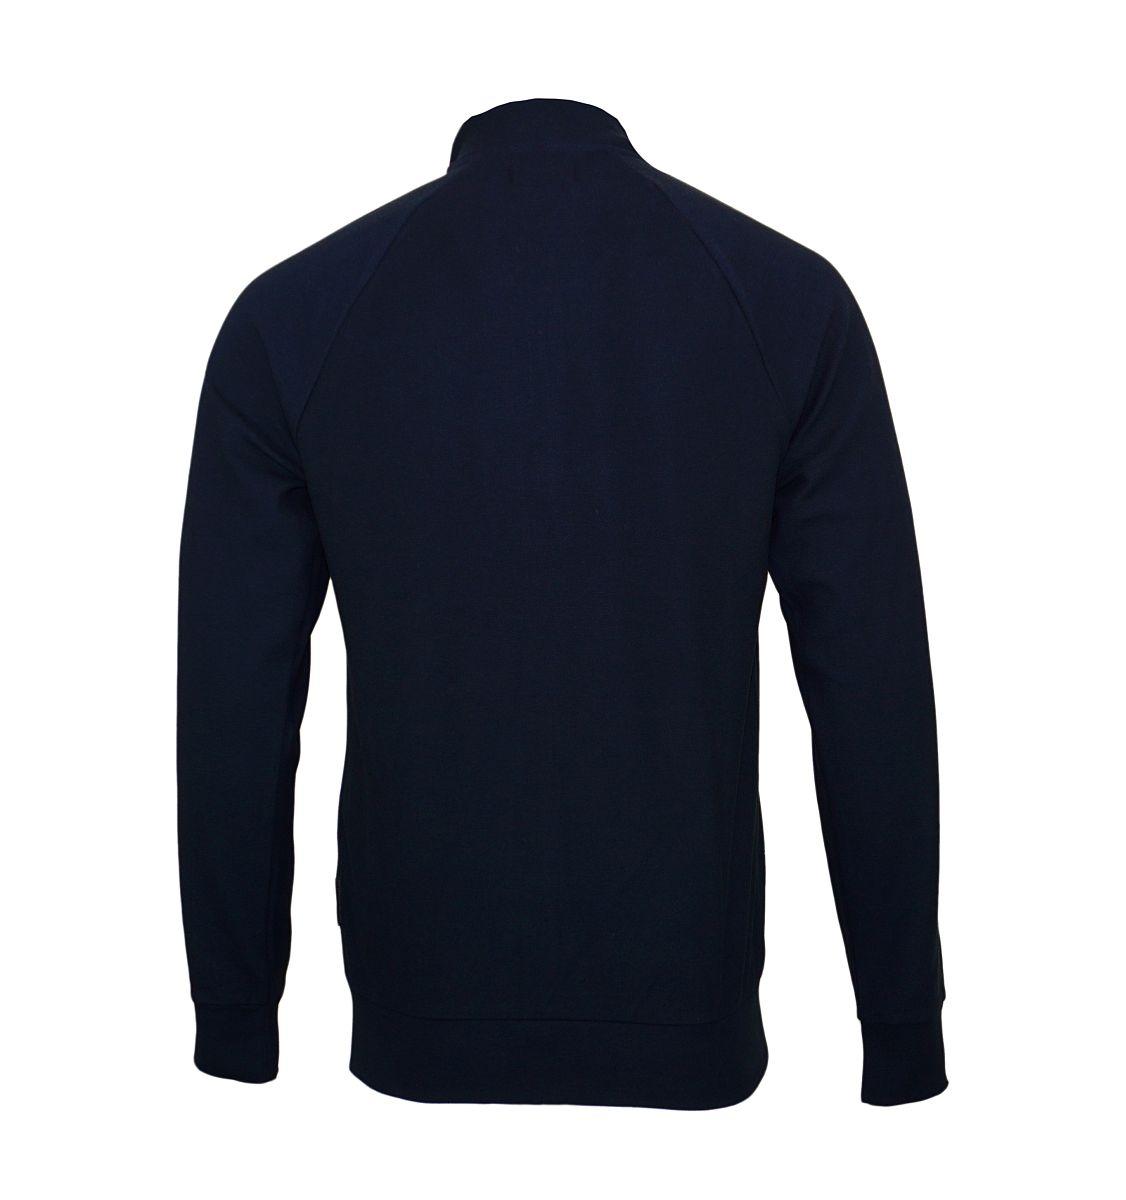 Emporio Armani Sweater Jacke Sweatjacke 111570 7A569 00135 MARINE HW17-EAS1